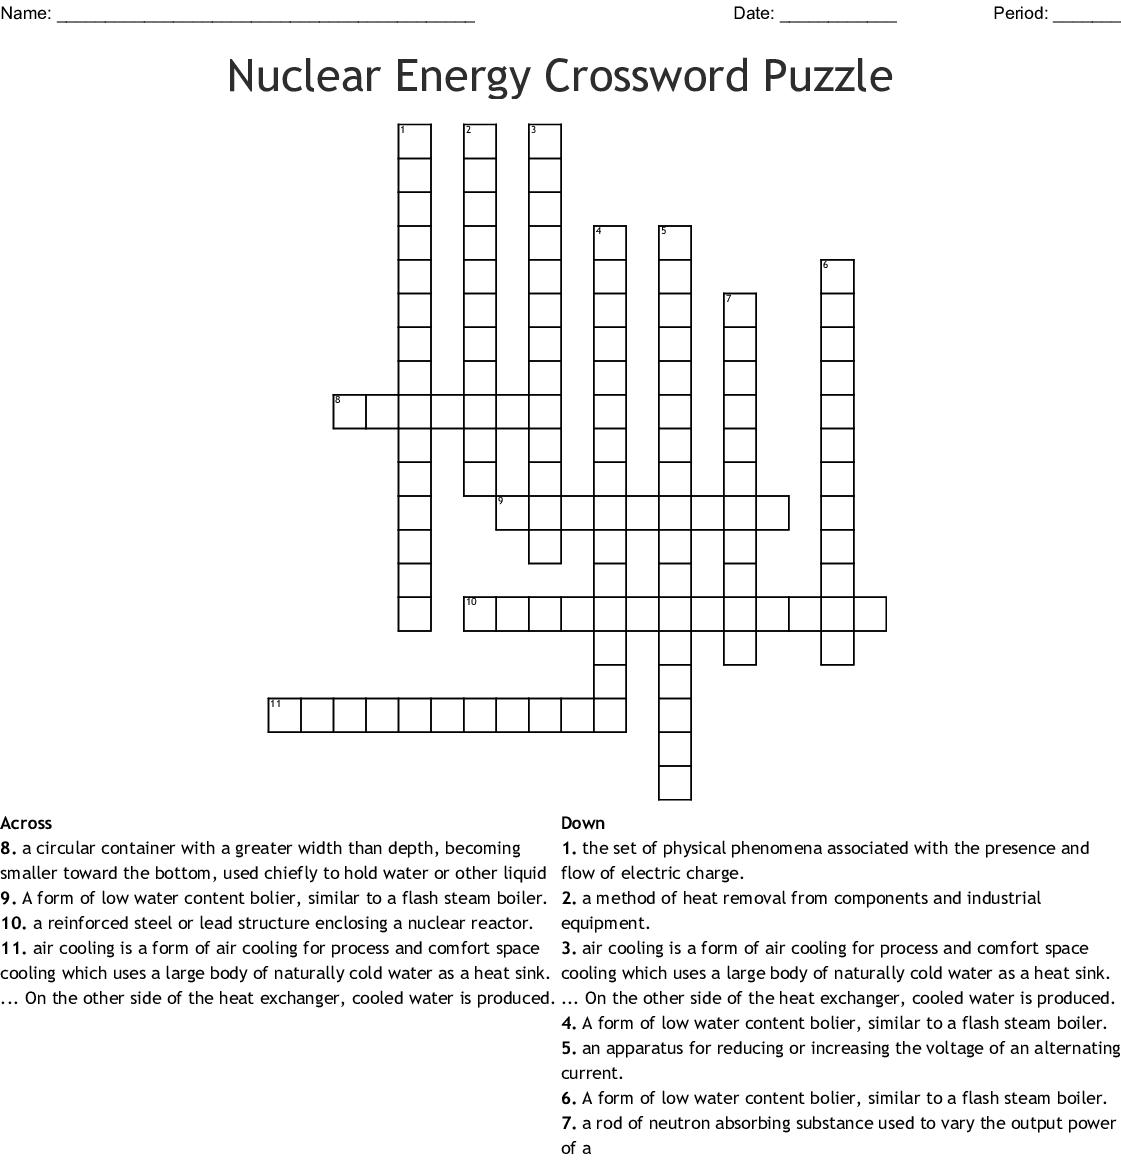 Nuclear Energy Crossword Puzzle - WordMint